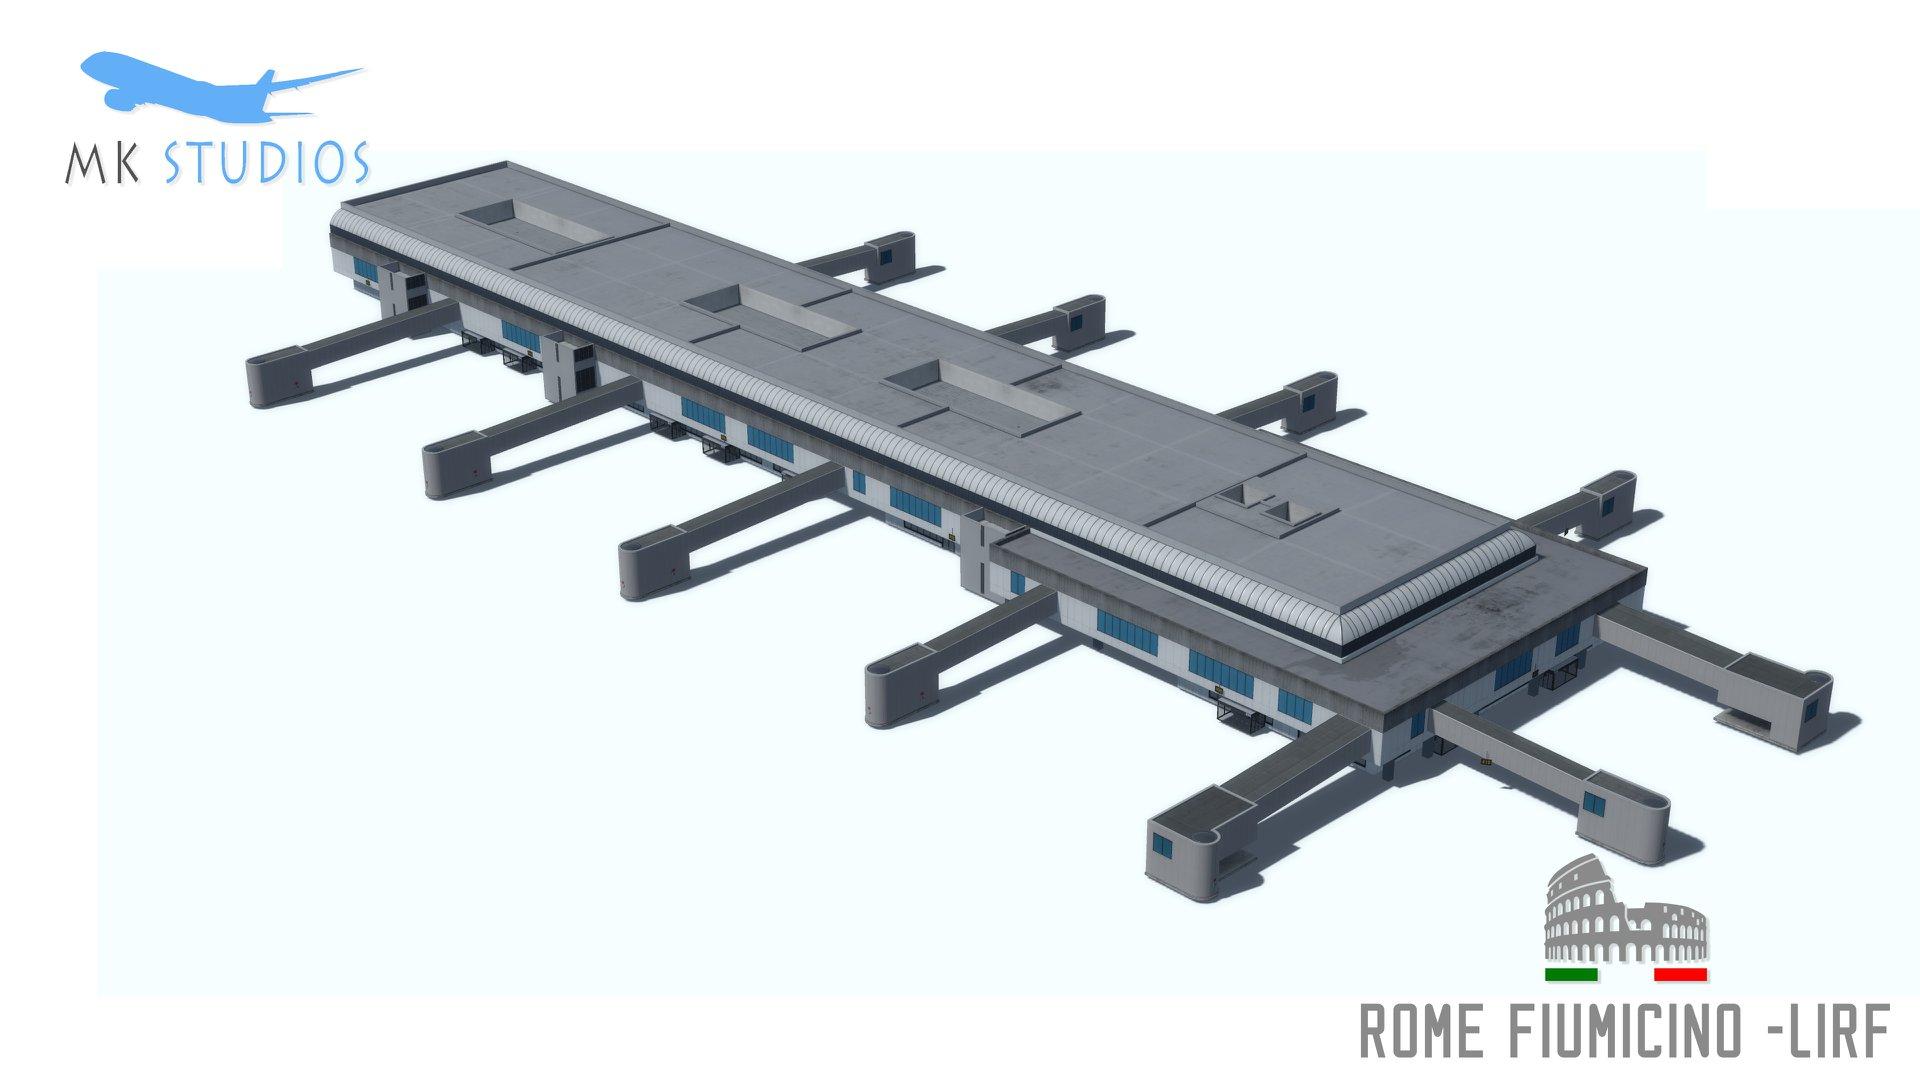 Rome1 MK-Studios Unveils Rome-Fiumicino